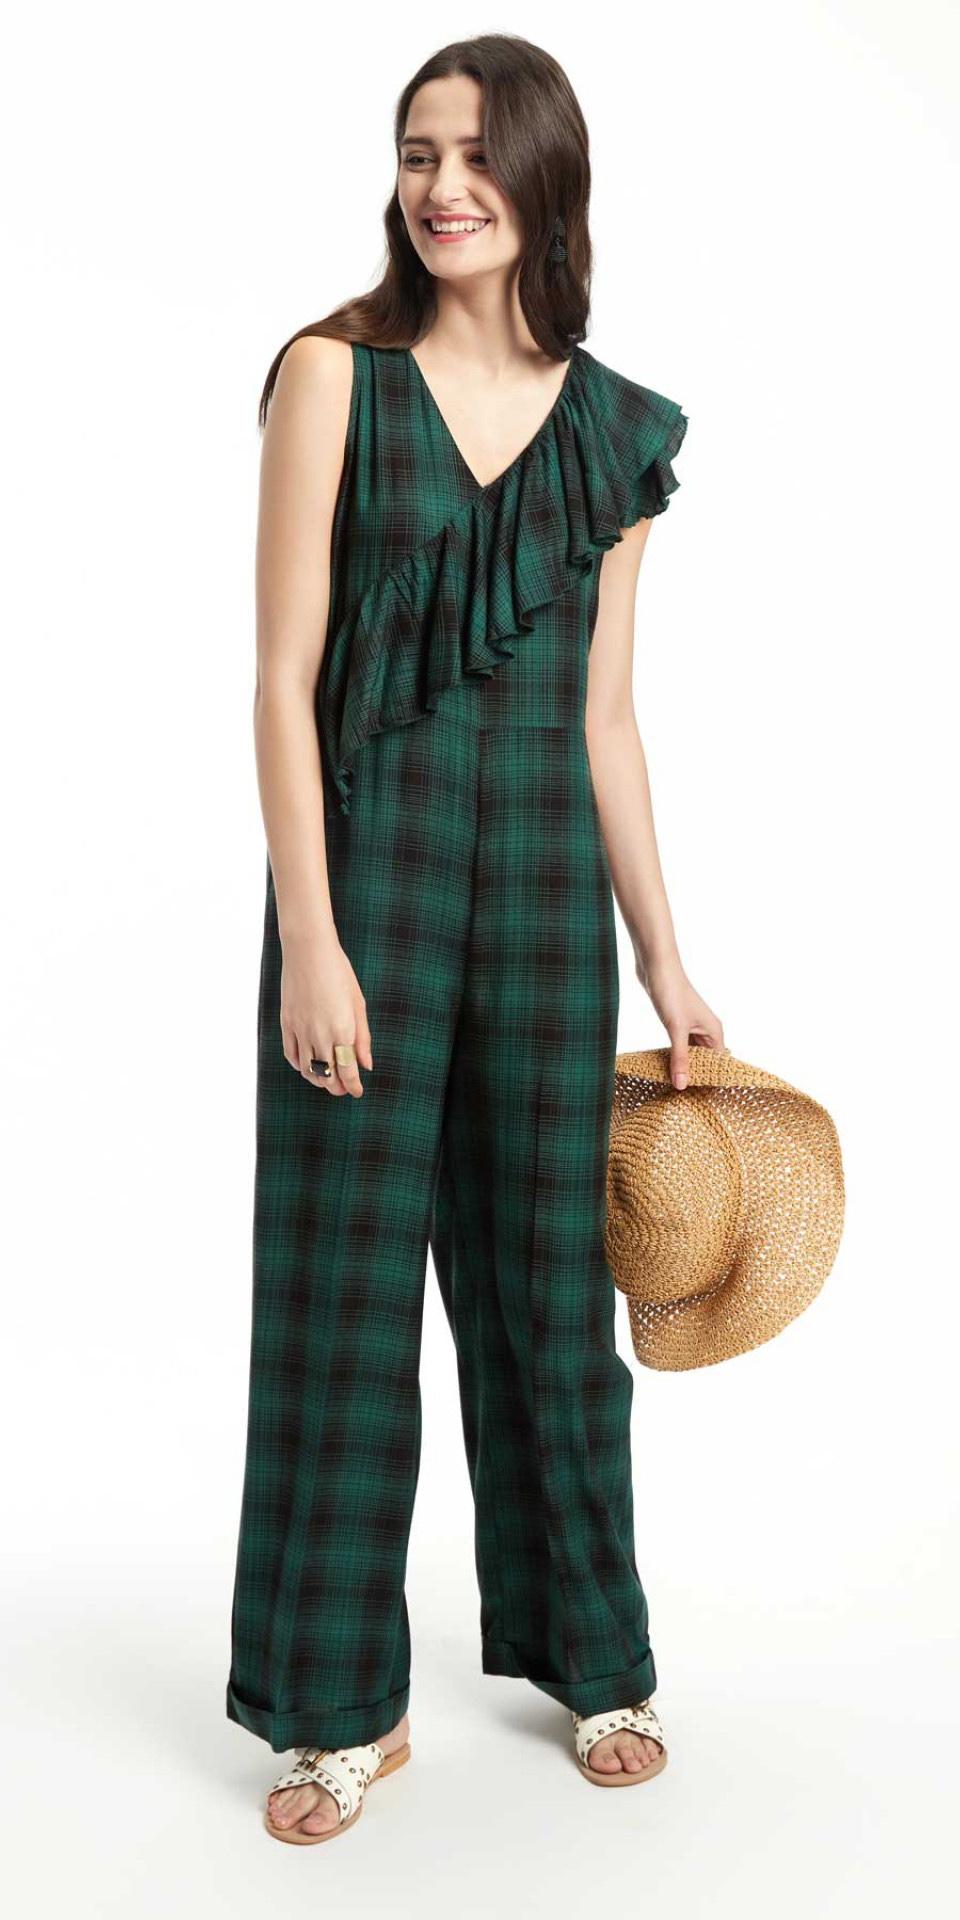 green-dark-jumpsuit-plaid-ruffle-hat-white-shoe-sandals-howtowear-spring-summer-brun-weekend.jpg